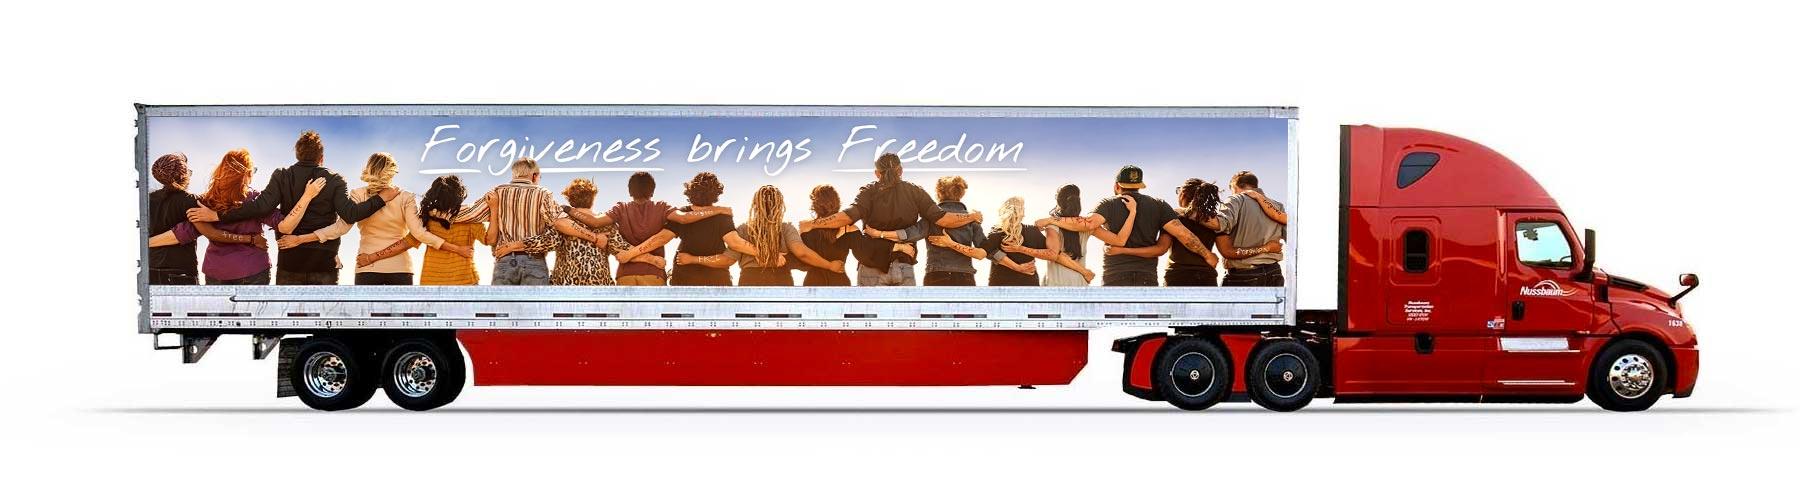 ForgivenessBringsFreedom_Truck